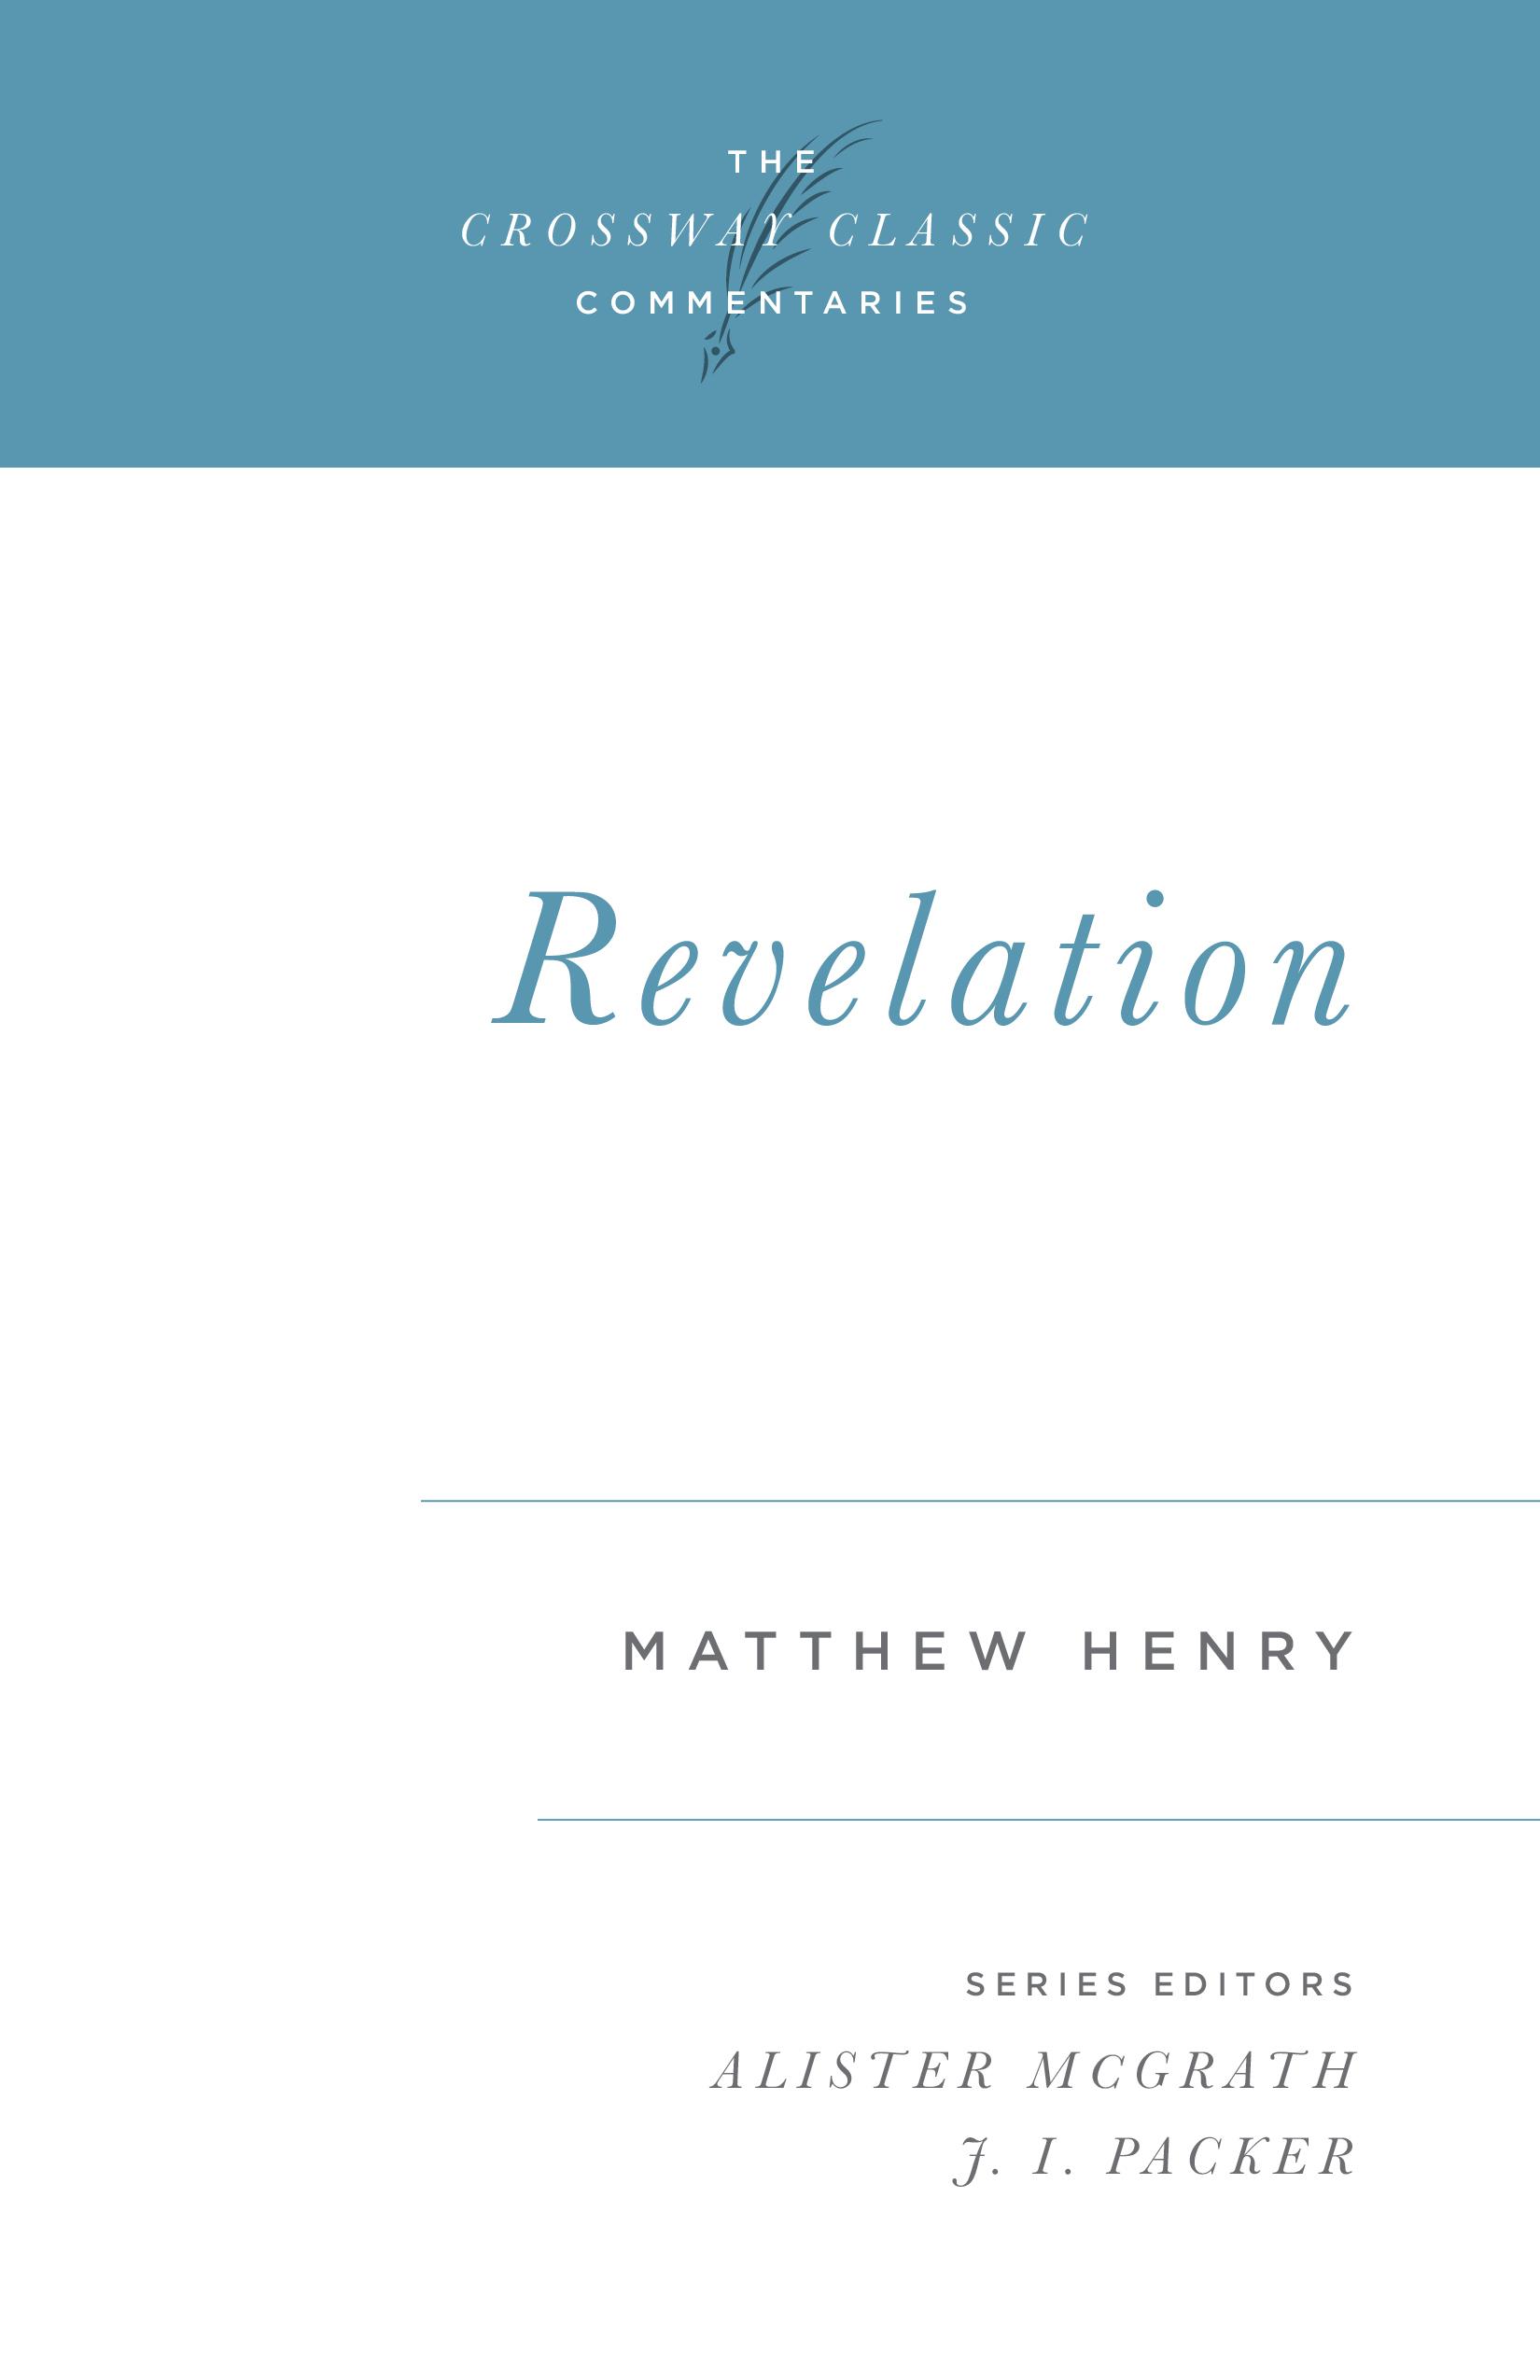 Crossway Classic Commentary - Revelation